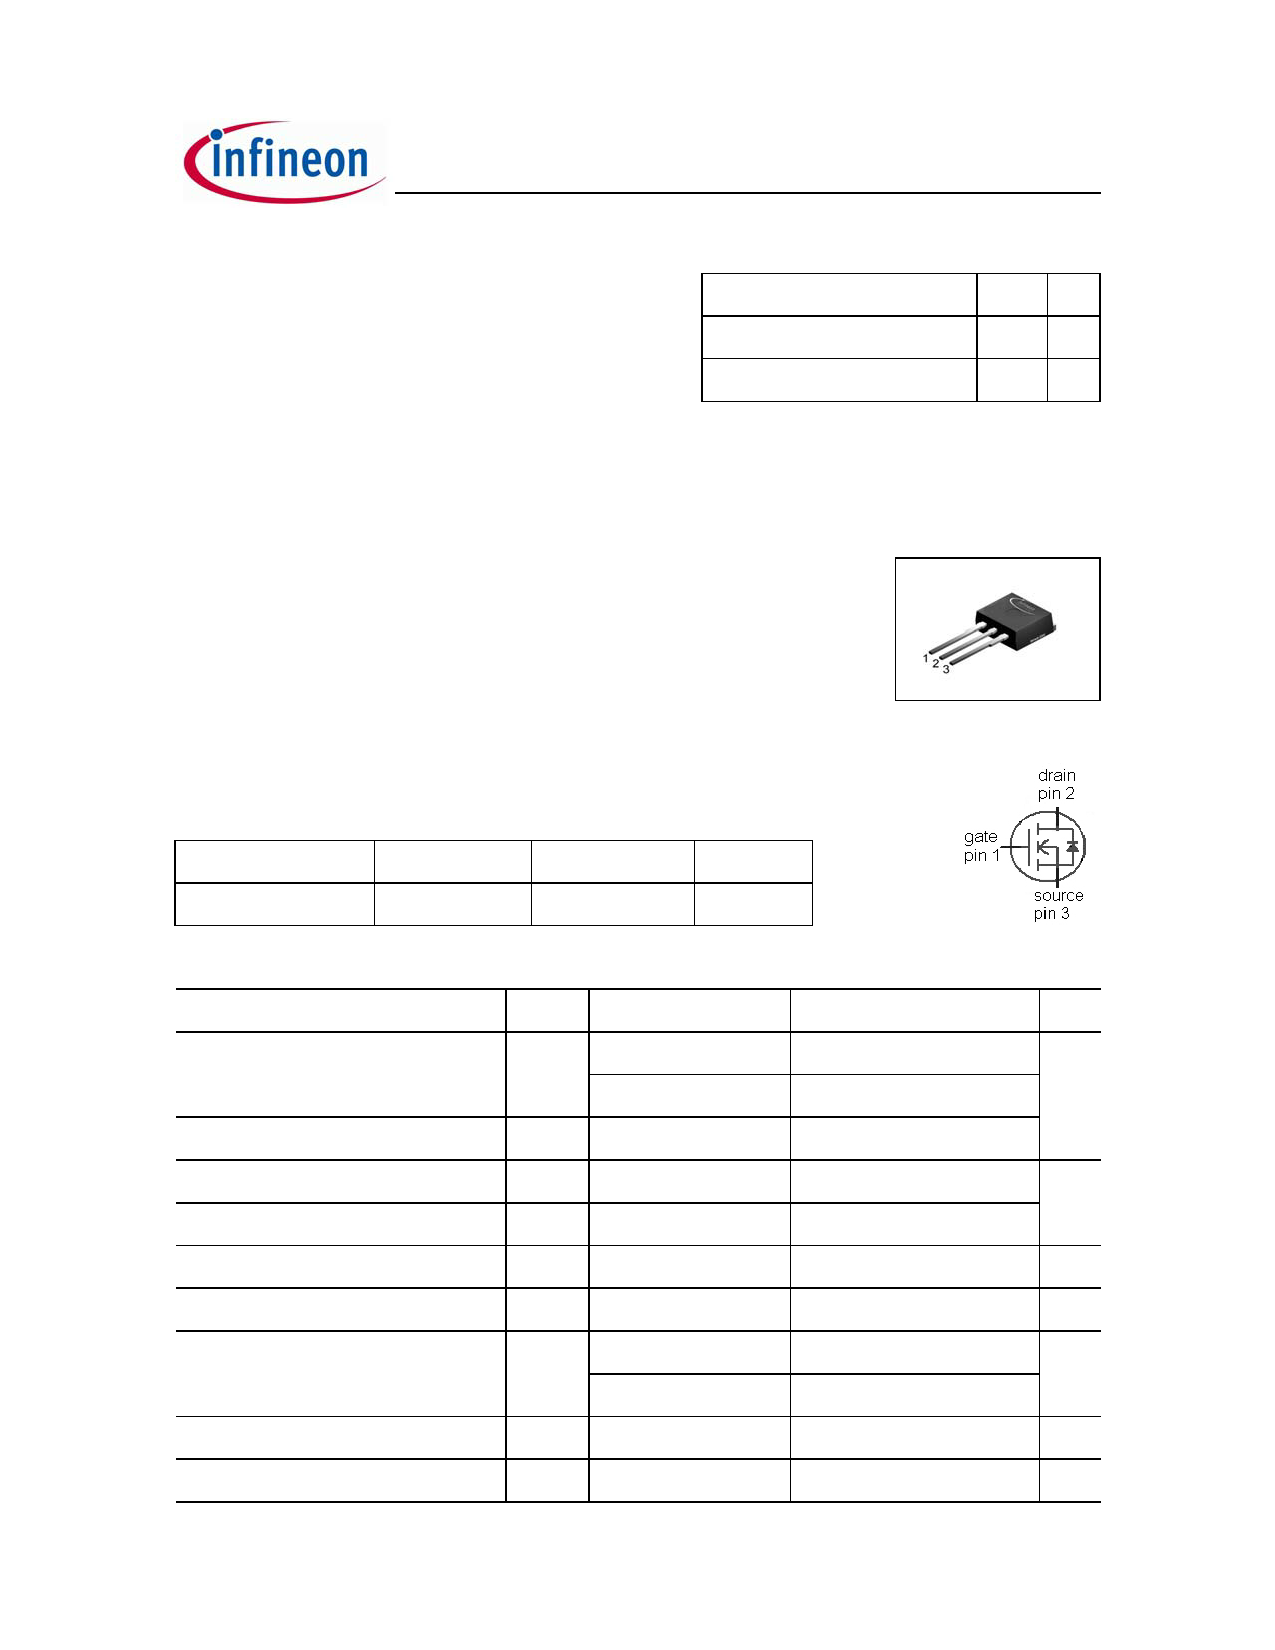 6R385P datasheet